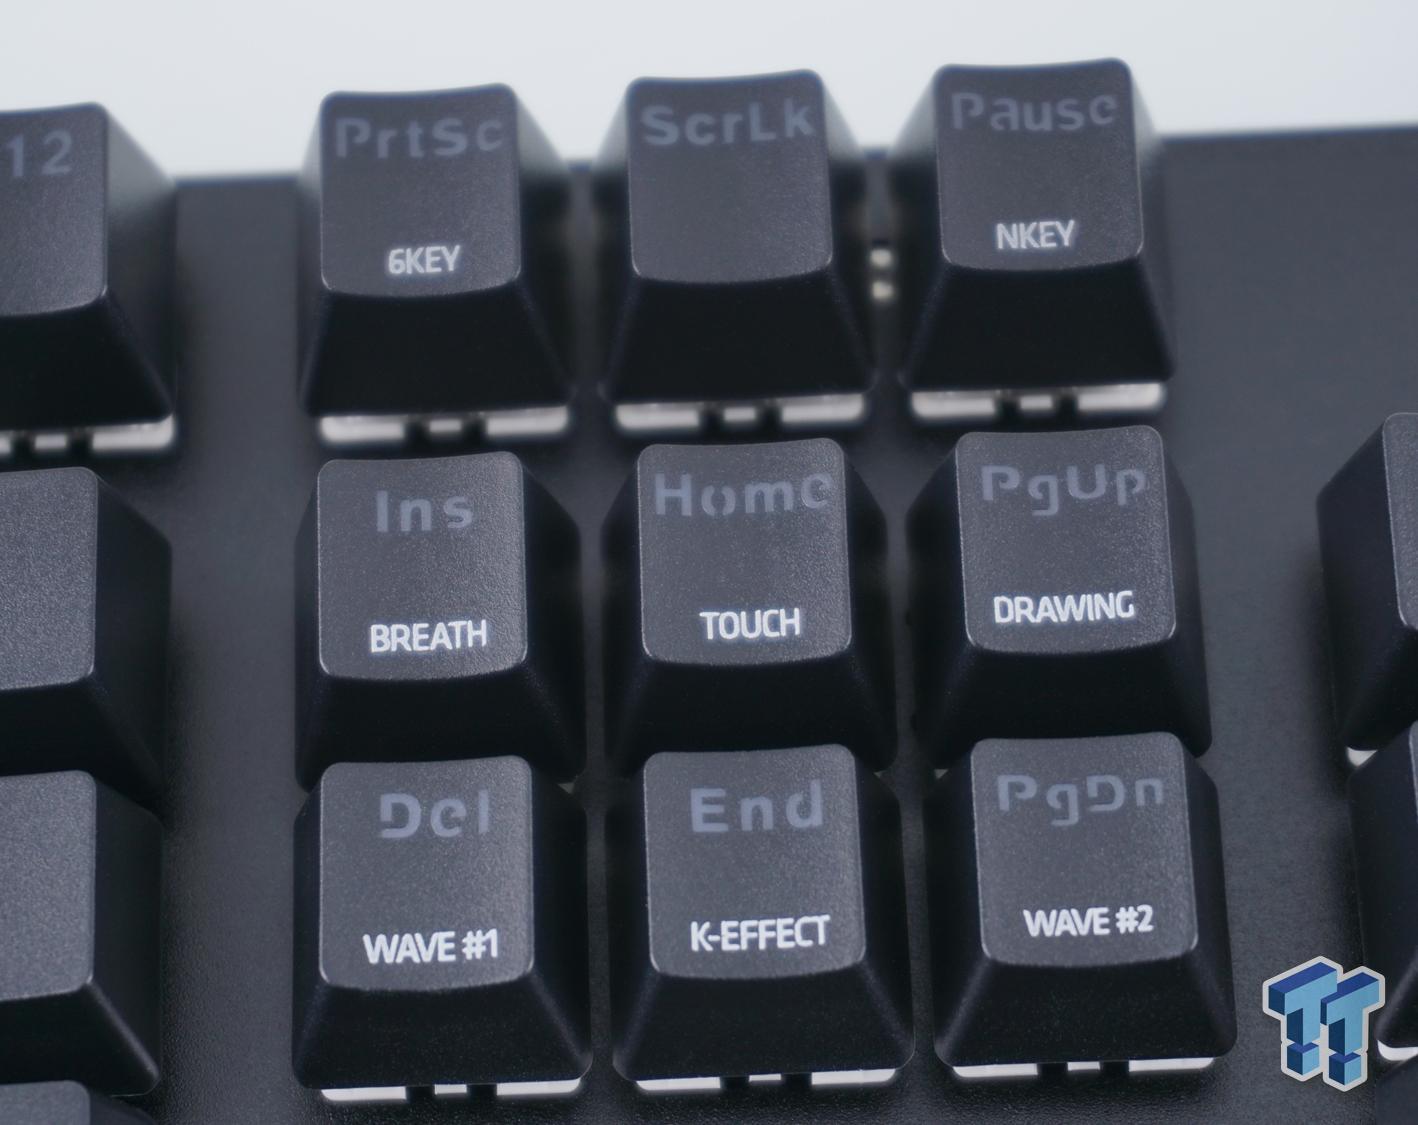 Glorious Modular Mechanical Gaming Keyboard - GMMK Review 17 | TweakTown.com